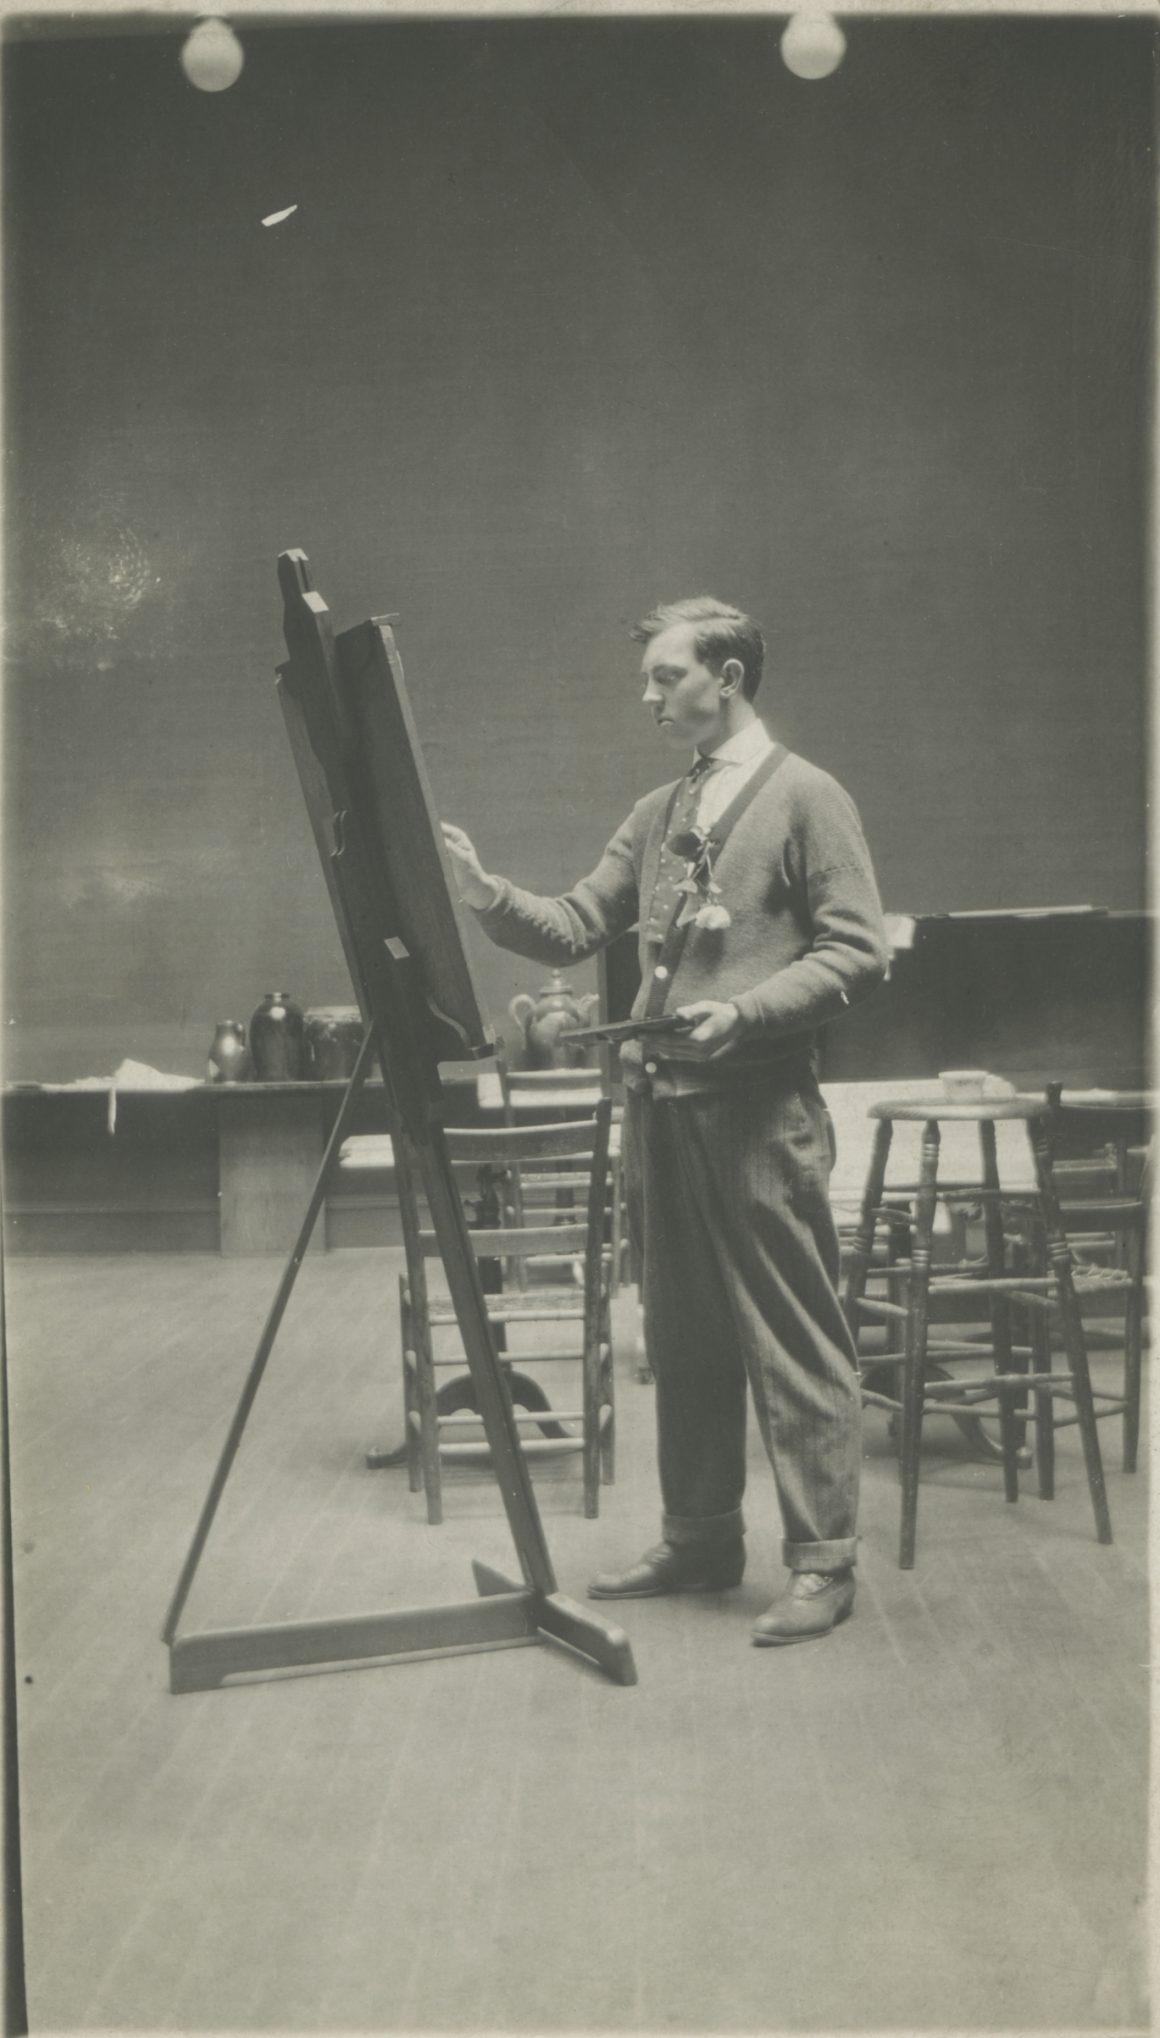 Black and white photograph of Raymond Jonson painting at the Portland Art School.